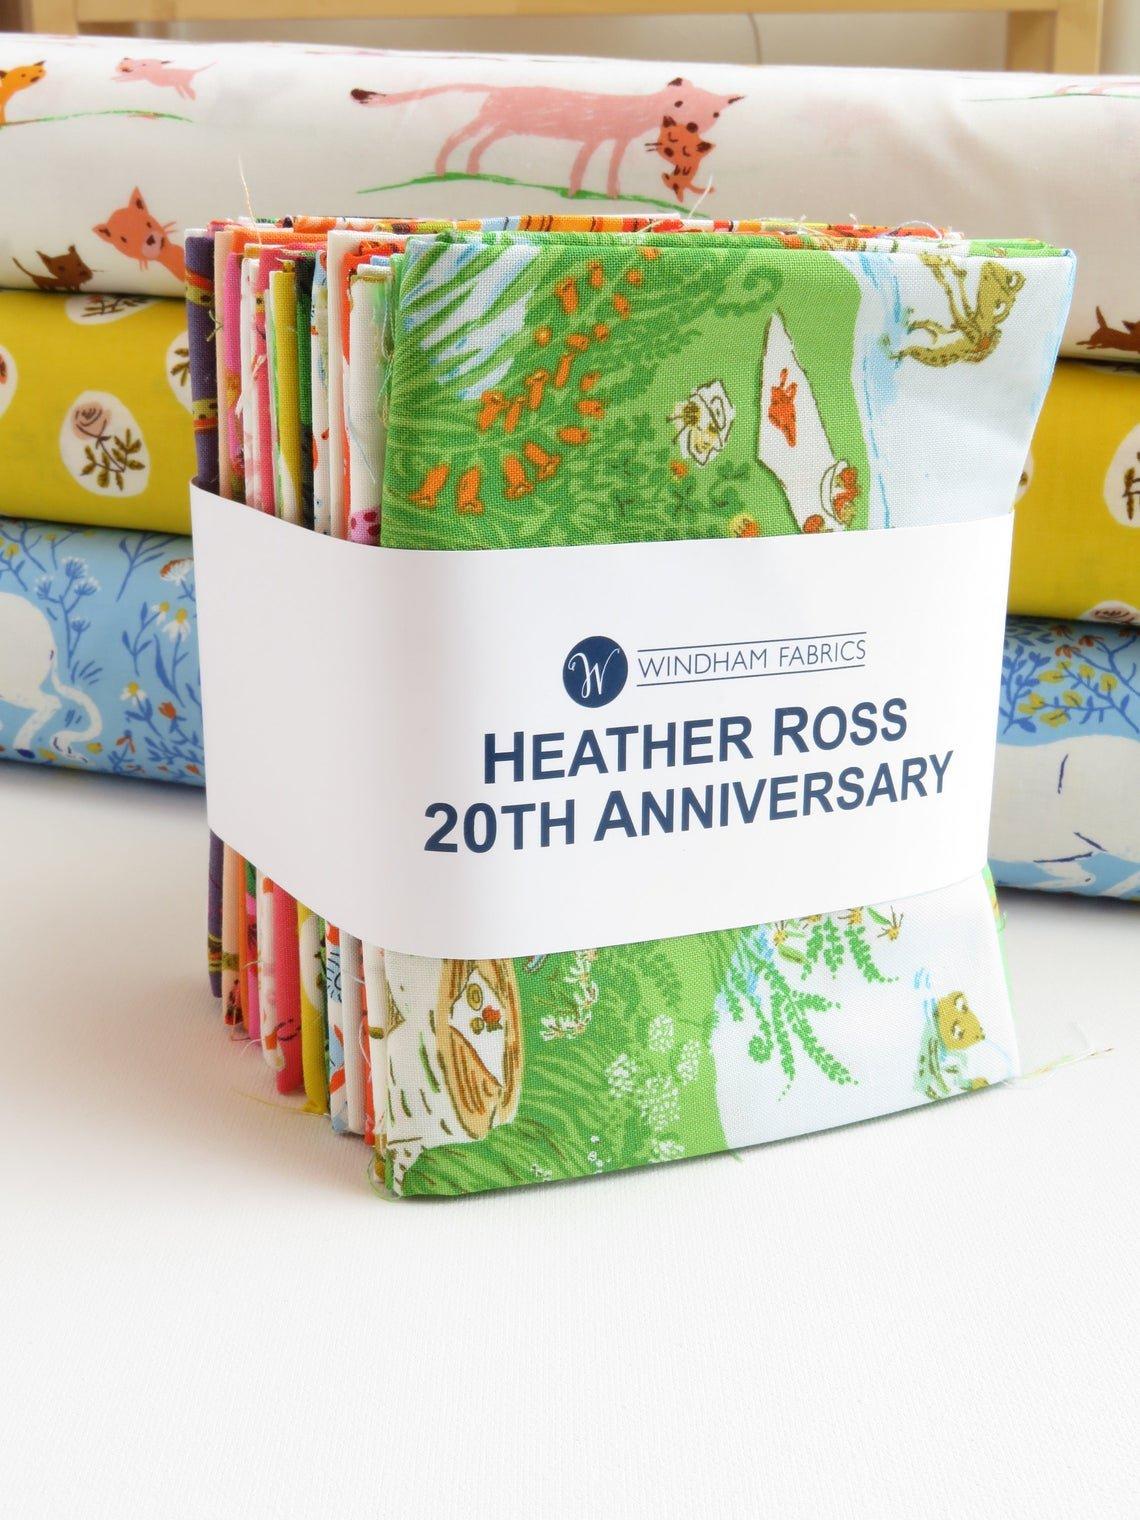 Heather Ross 20th Anniversary Fat Quarter Bundle - 21 pcs | Windham Fabrics SKU# H20FATQ